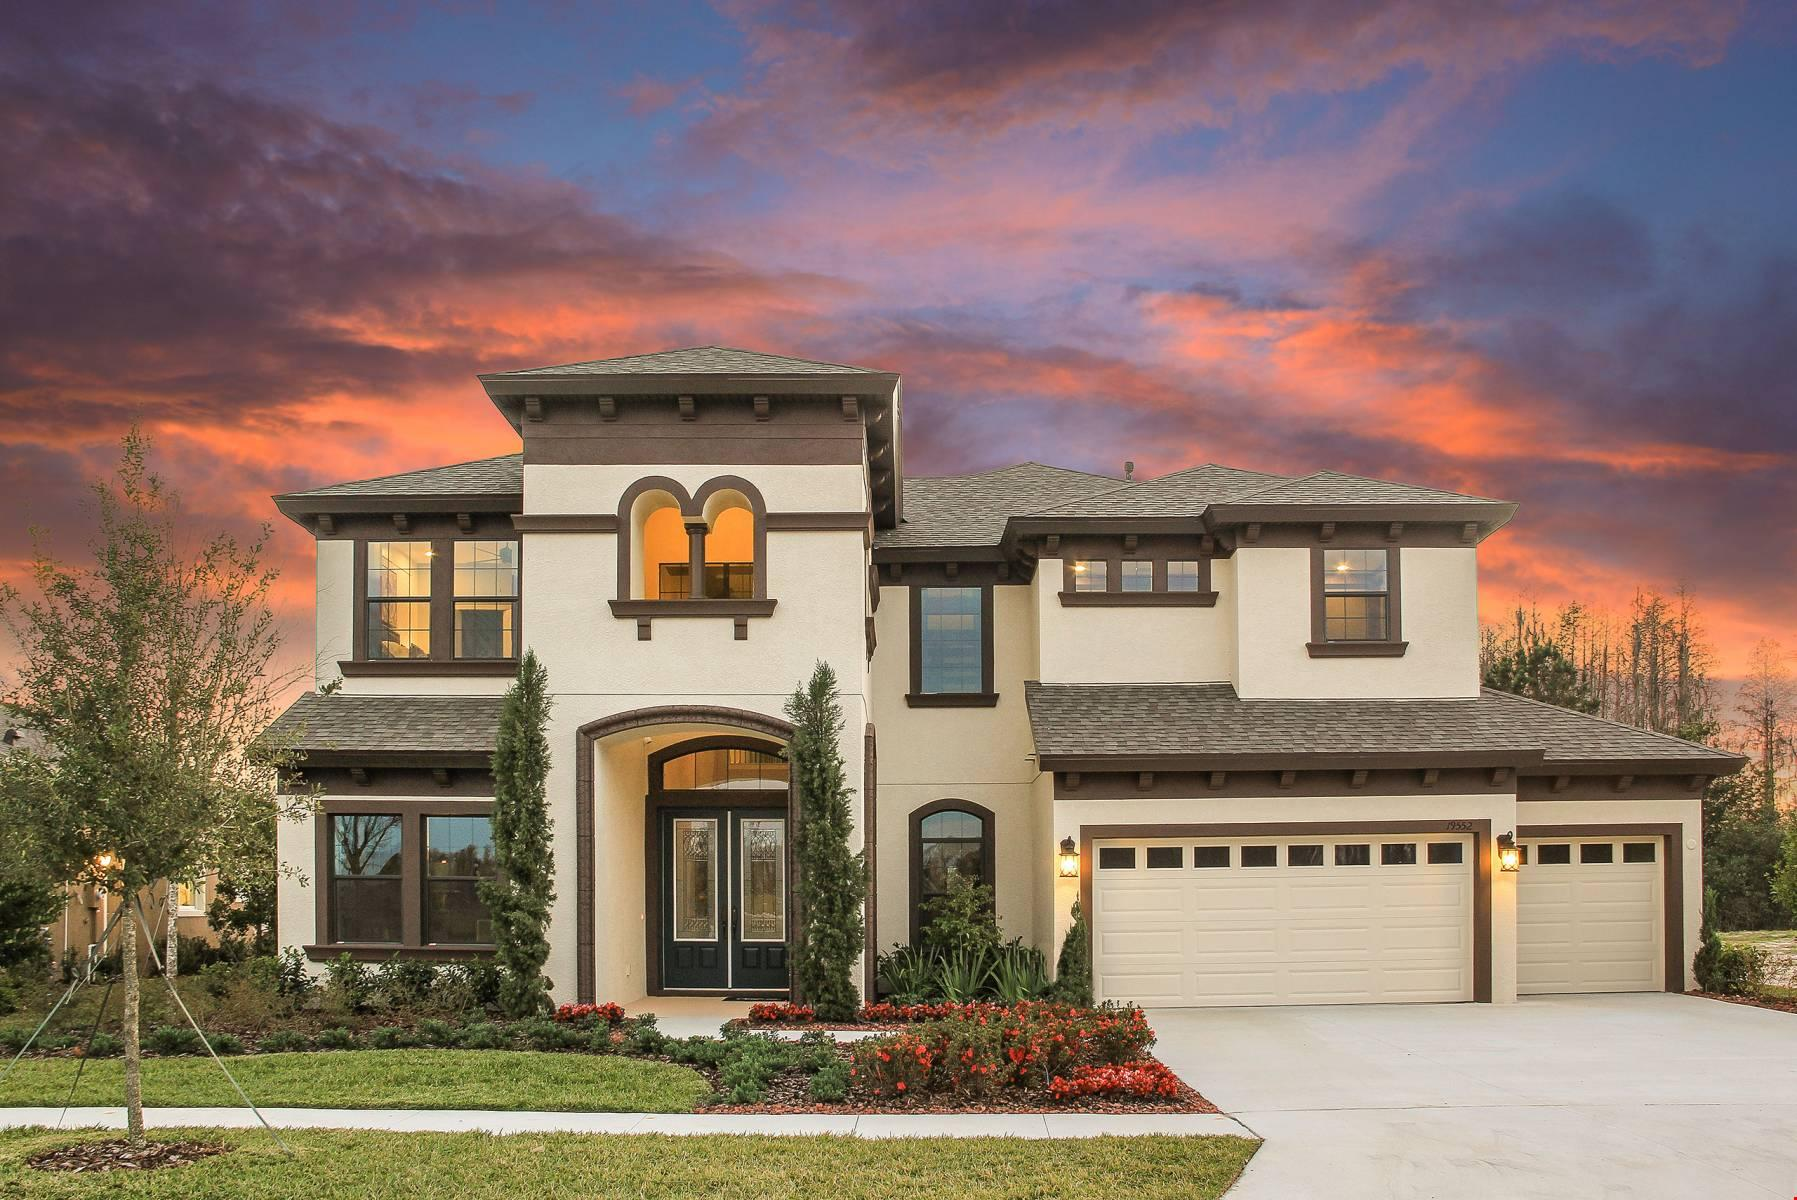 33629 South Tampa Florida Real Estate | 33629 South Tampa Florida Realtor | 33629 New Homes for Sale | 33629 South Tampa Florida